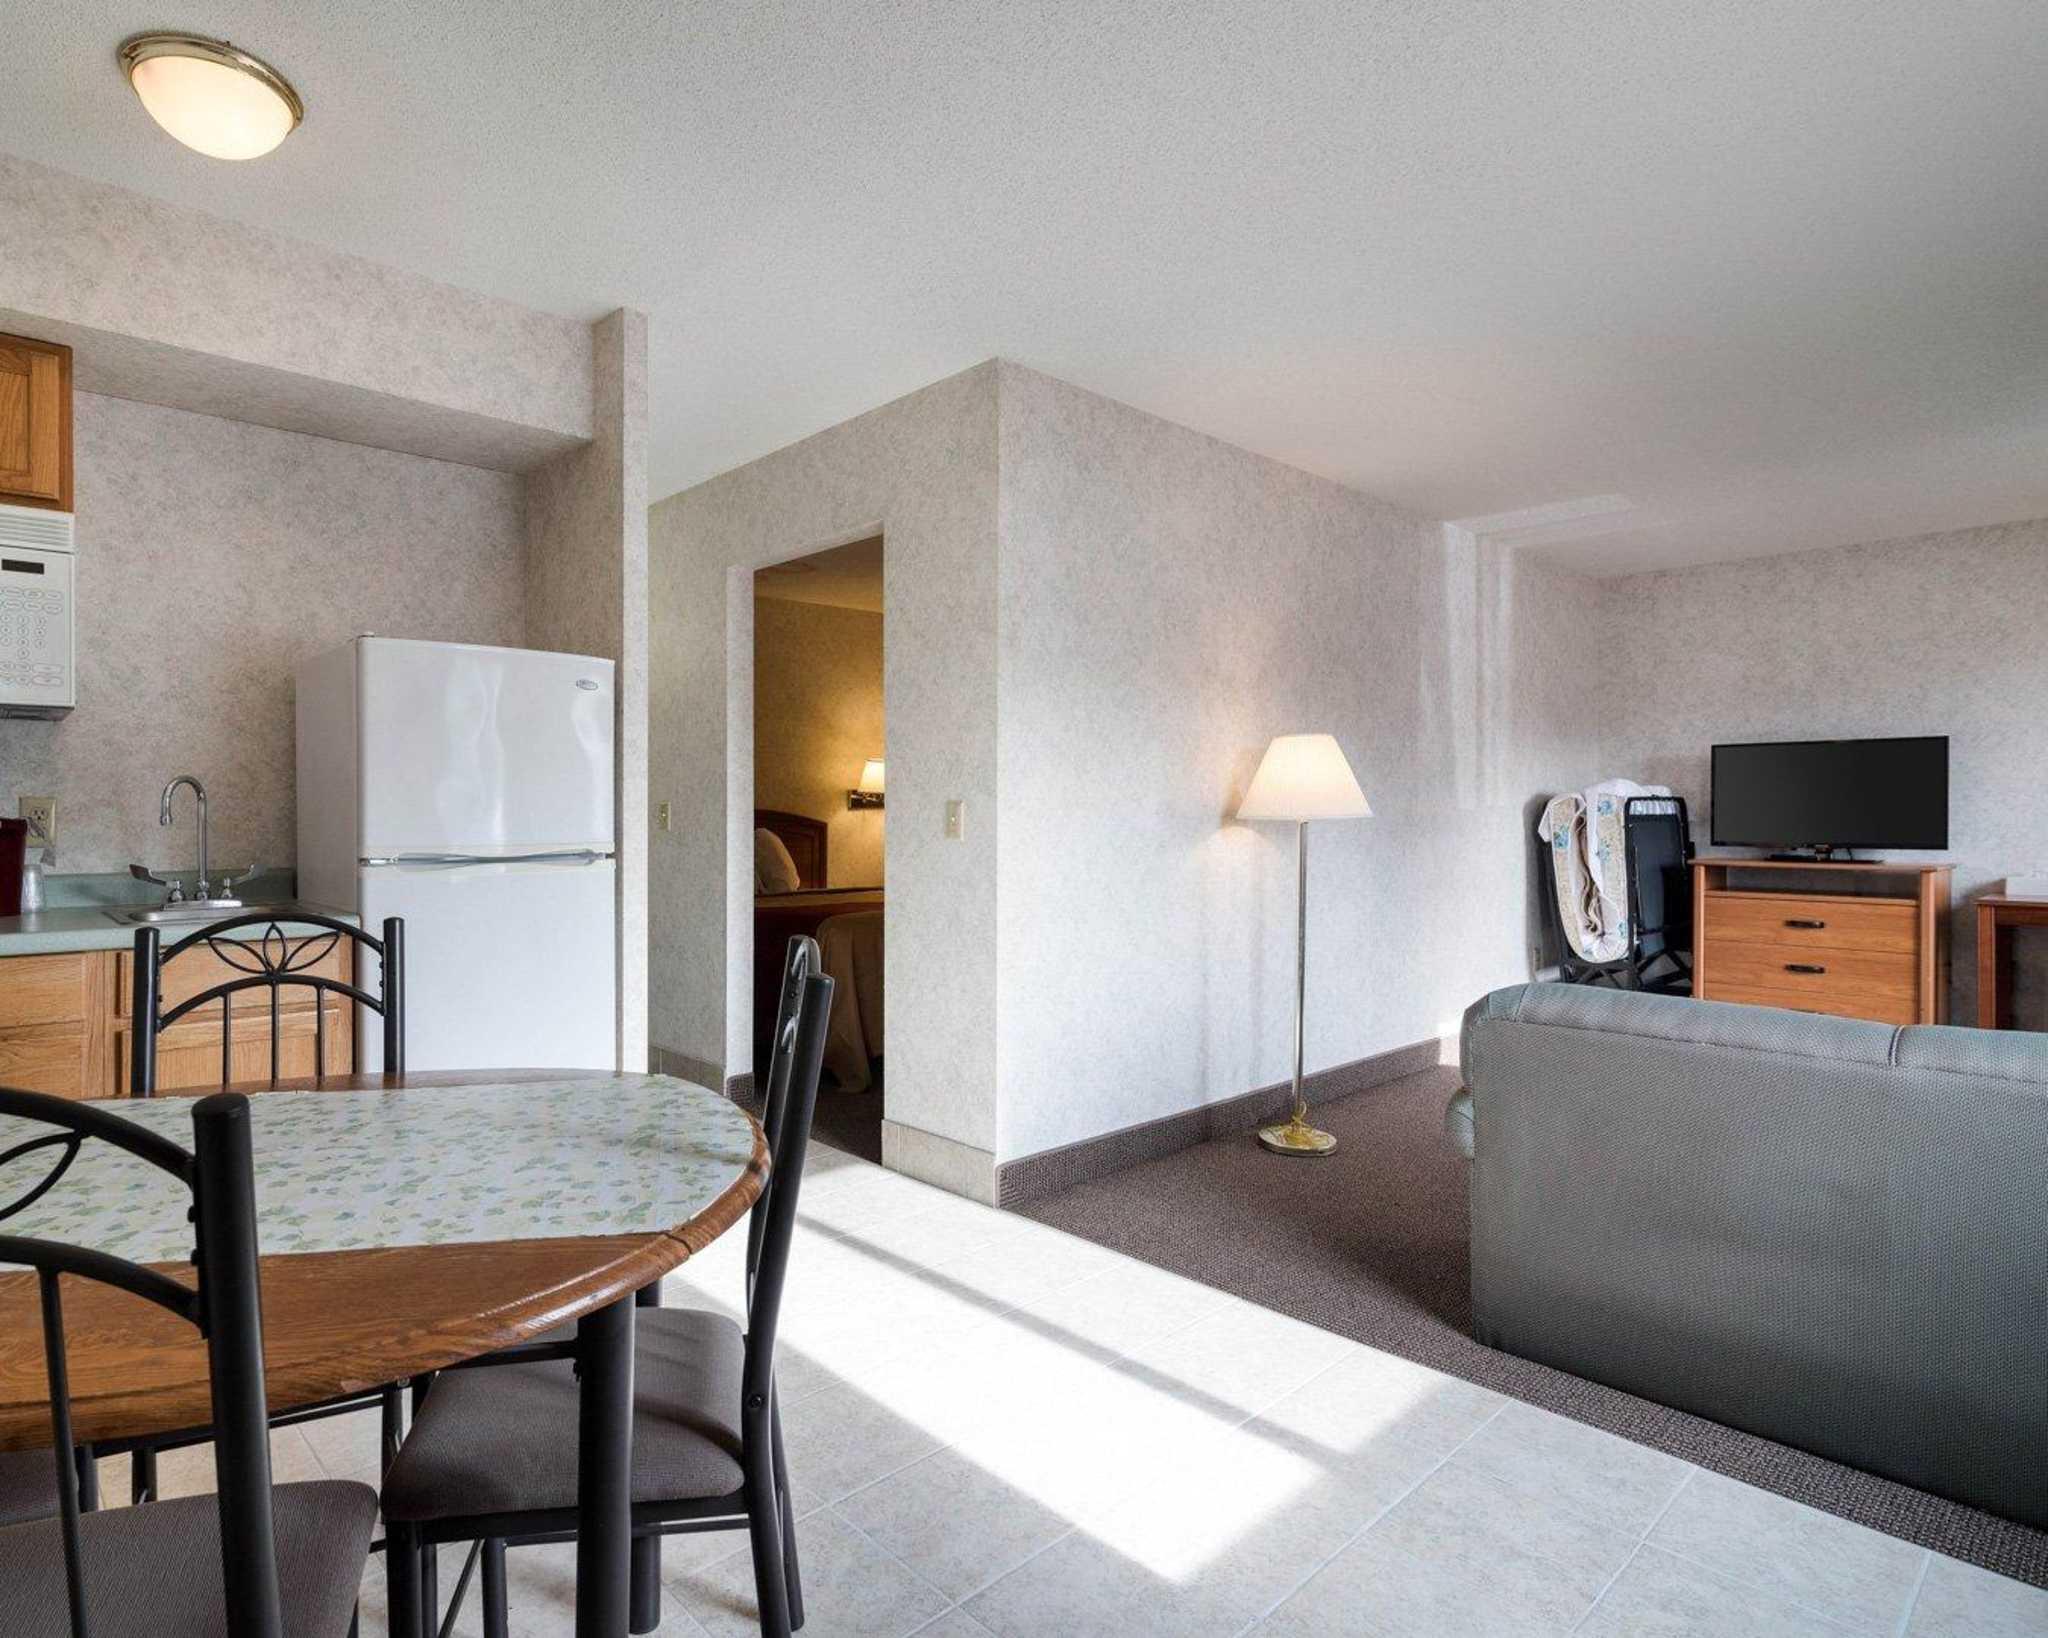 Econo Lodge Inn & Suites image 9